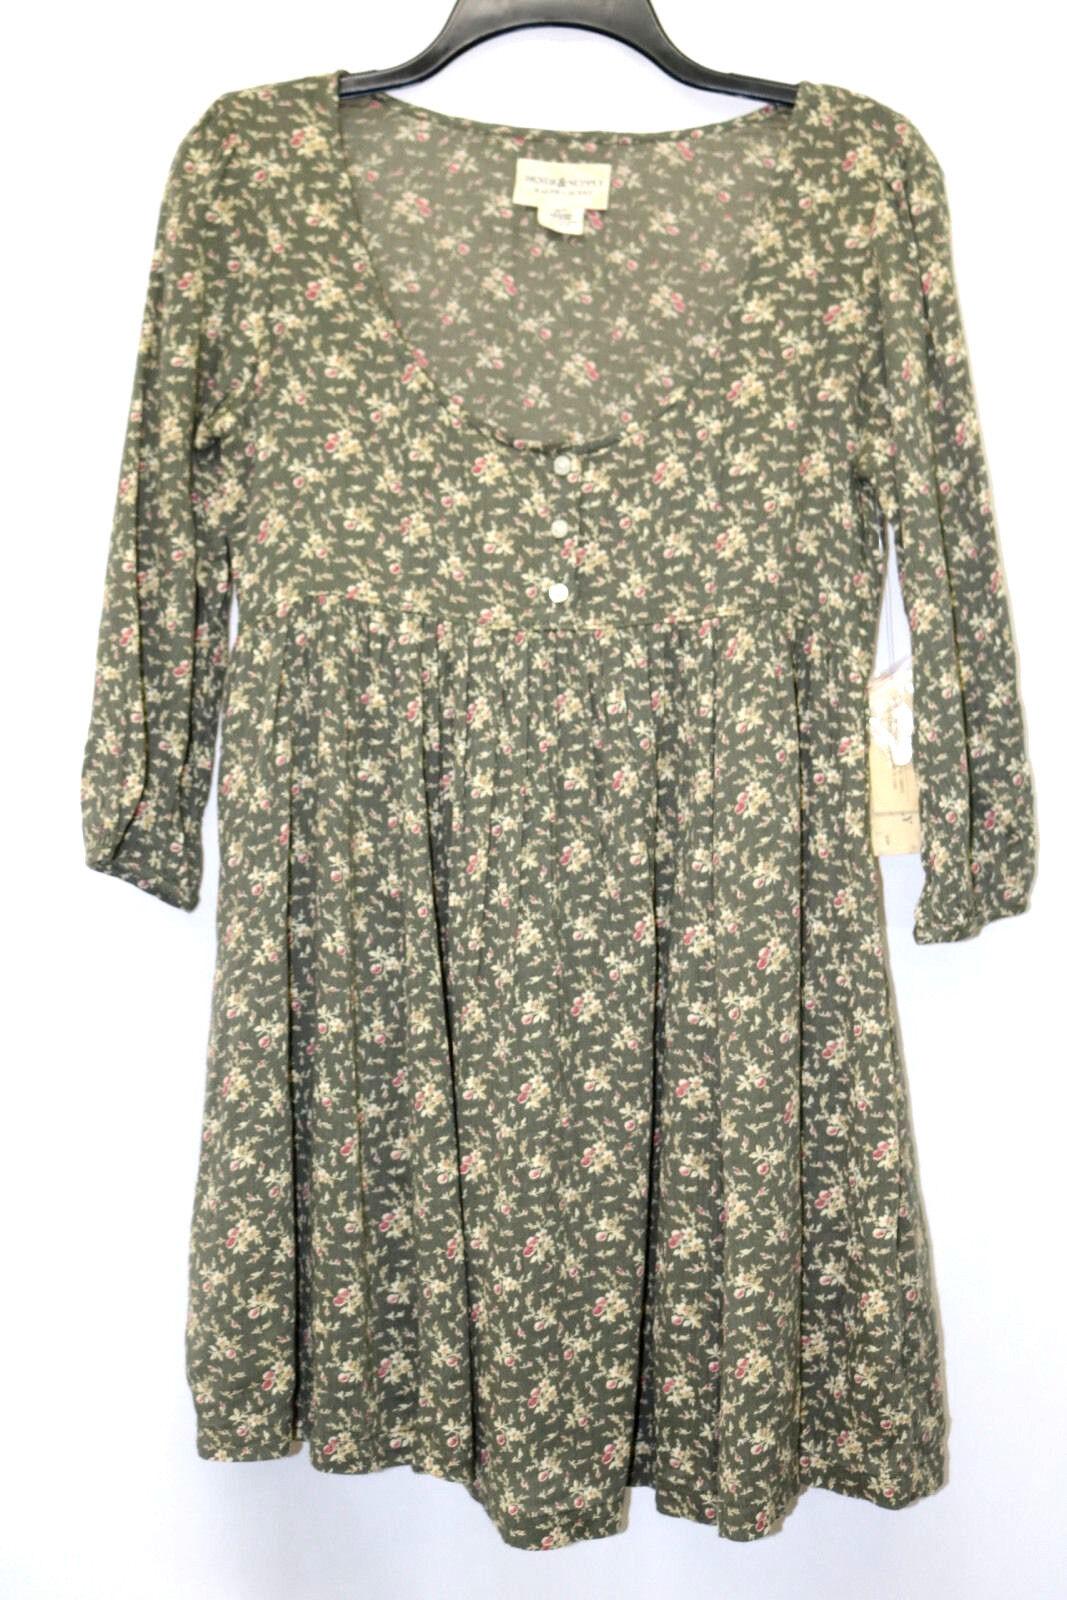 Denim & Supply Ralph Lauren Dress Tunic Floral Print Henley Linden Olive Size XS